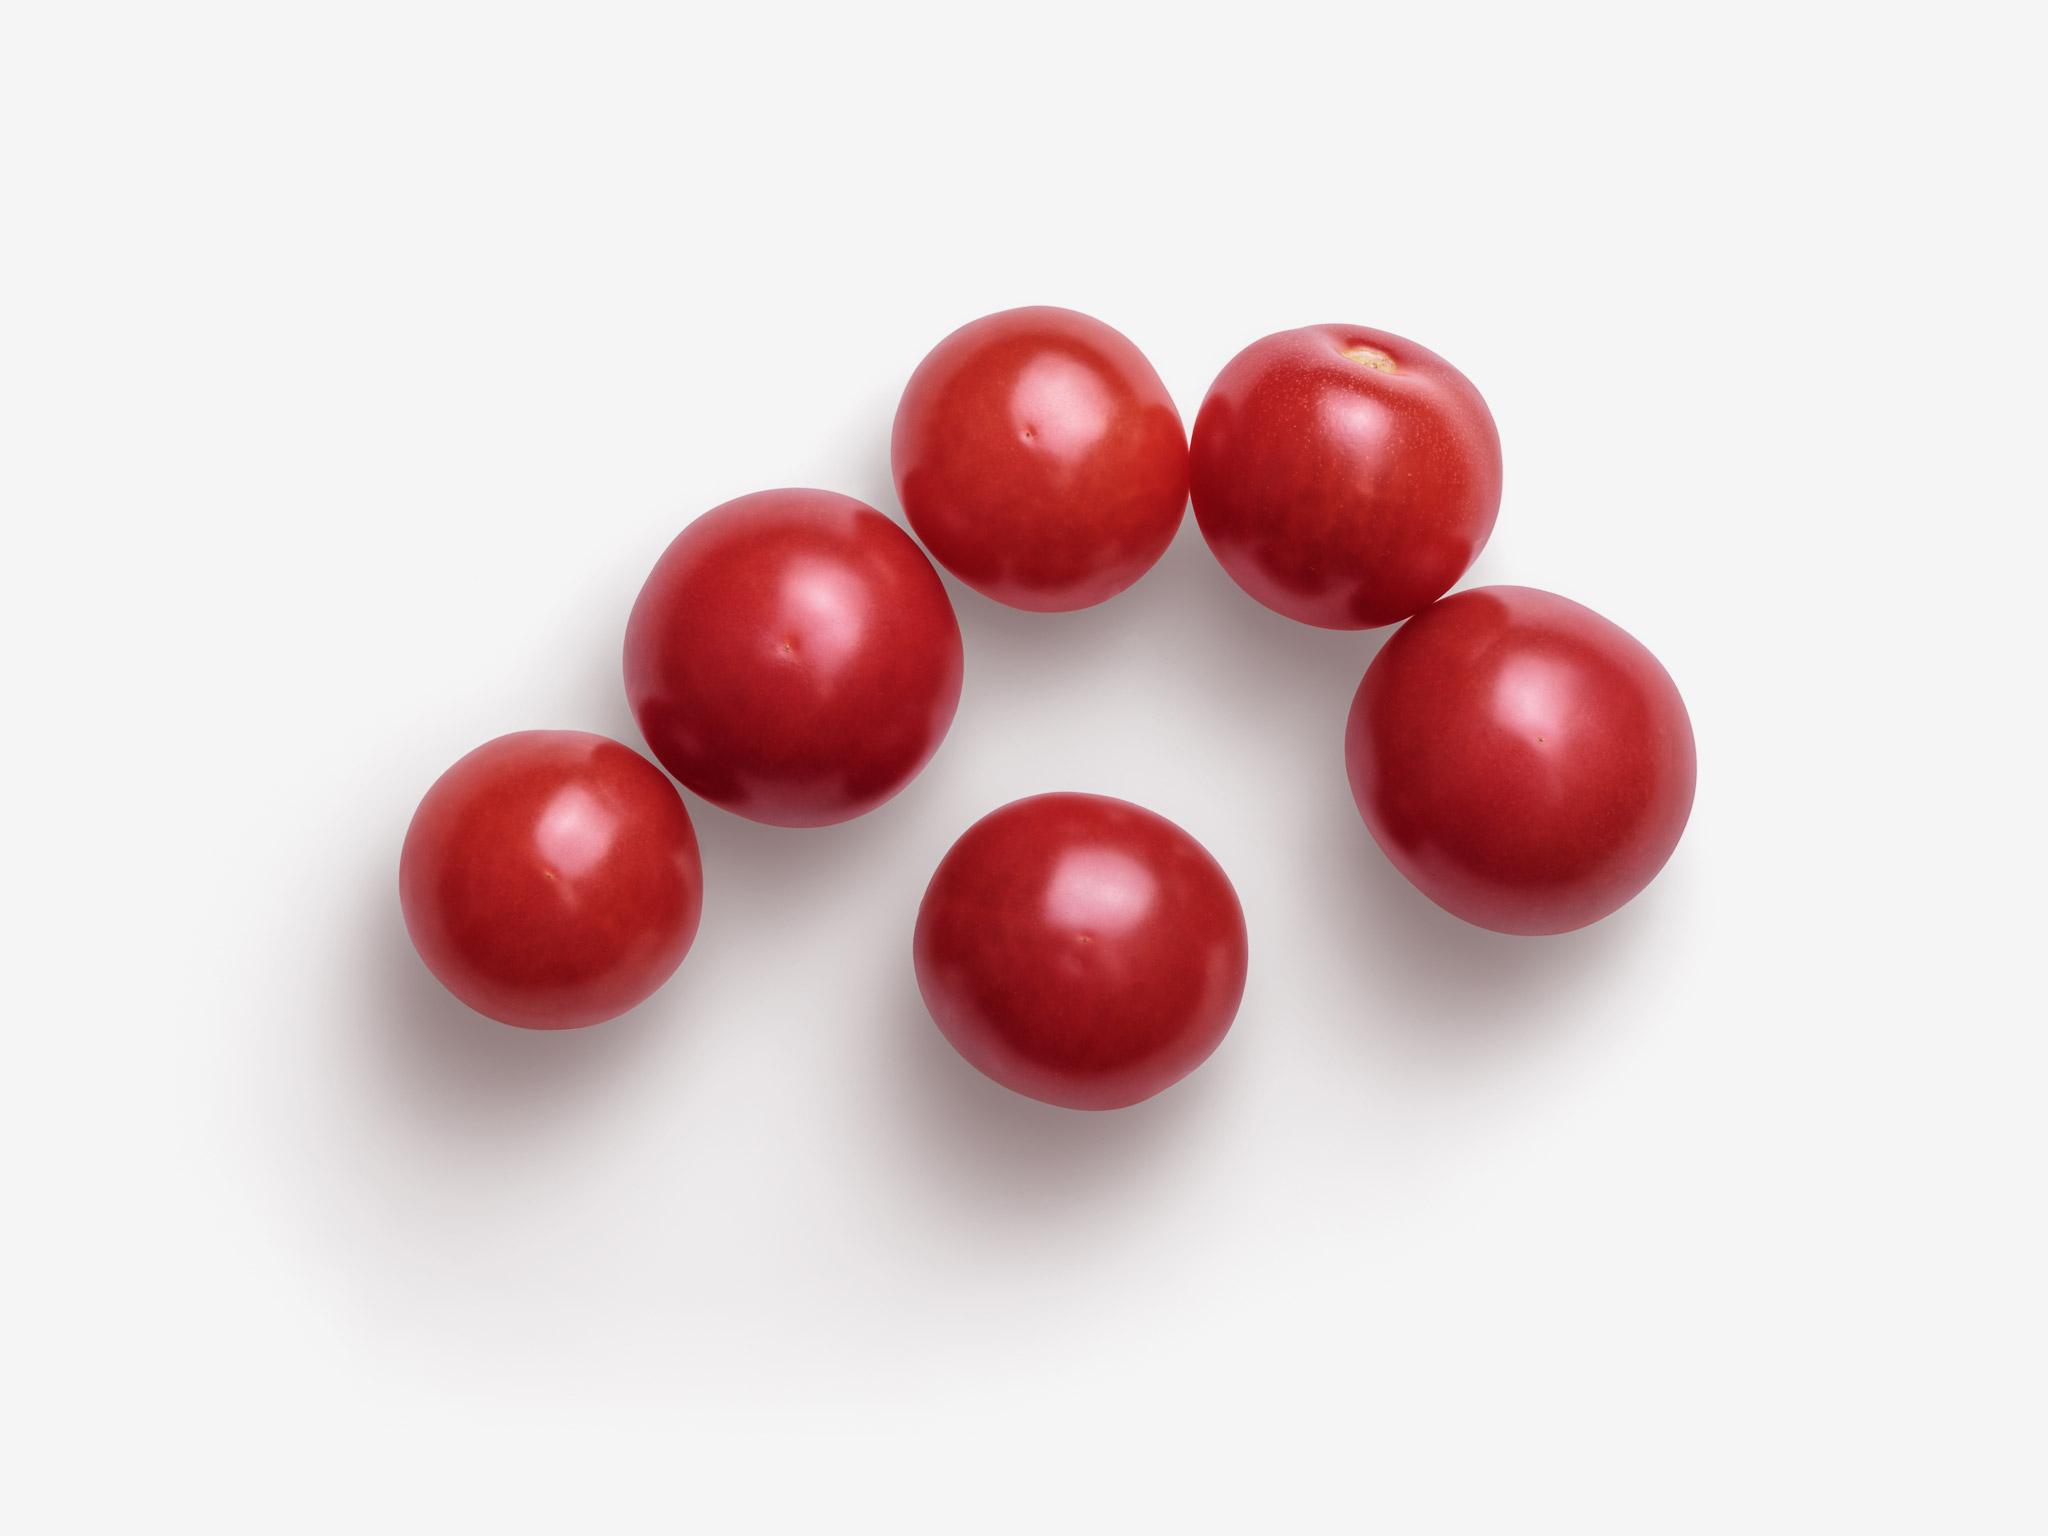 Tomato PSD isolated image